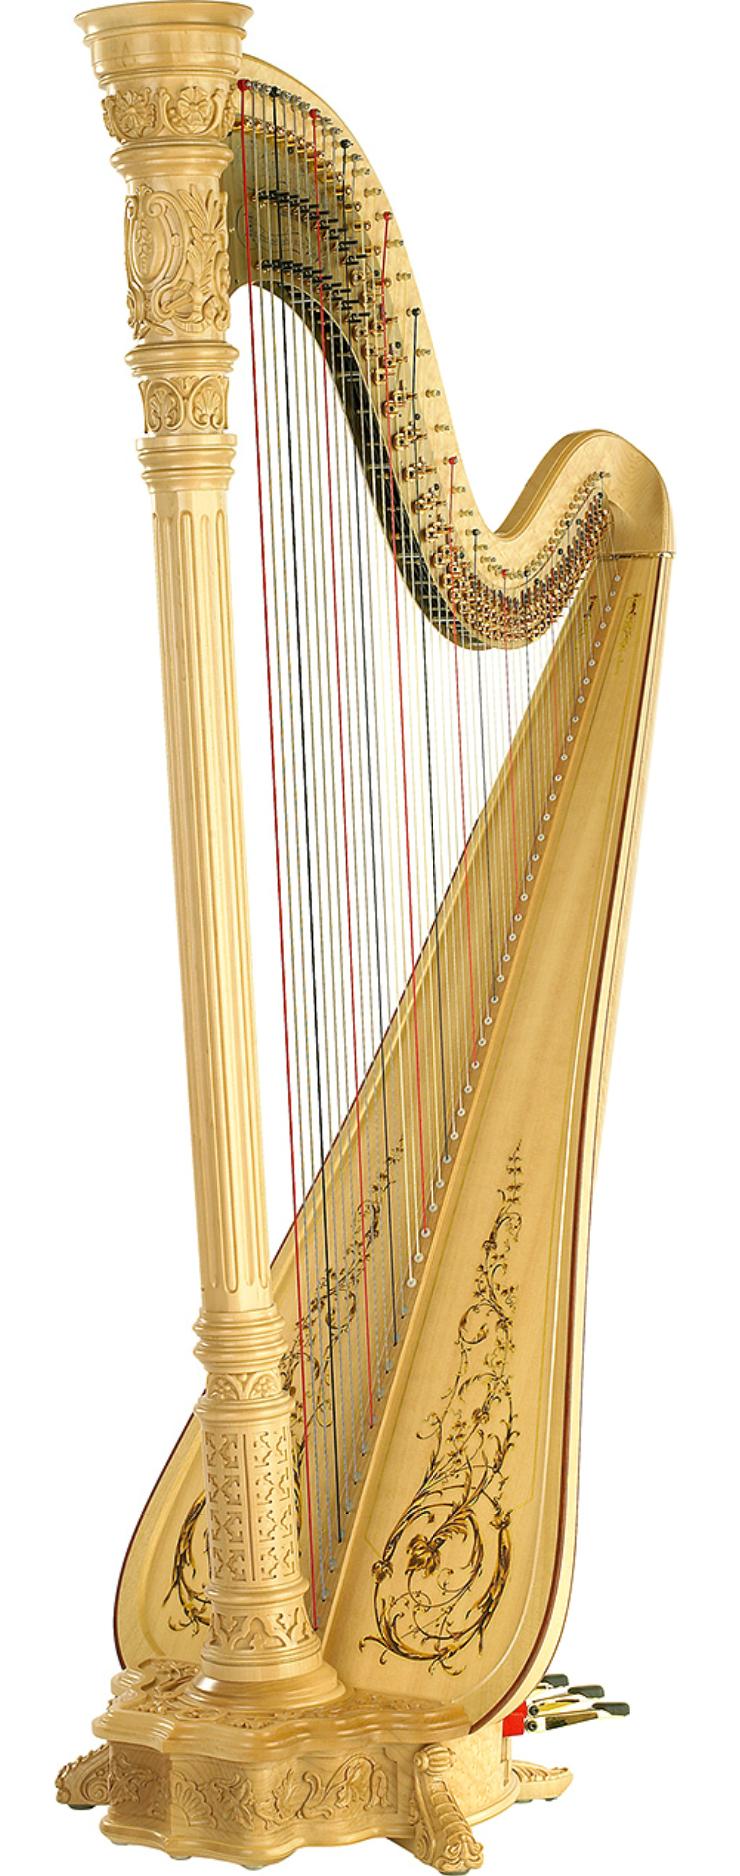 Lyon & Healy STYLE 23 - Pedálová harfa